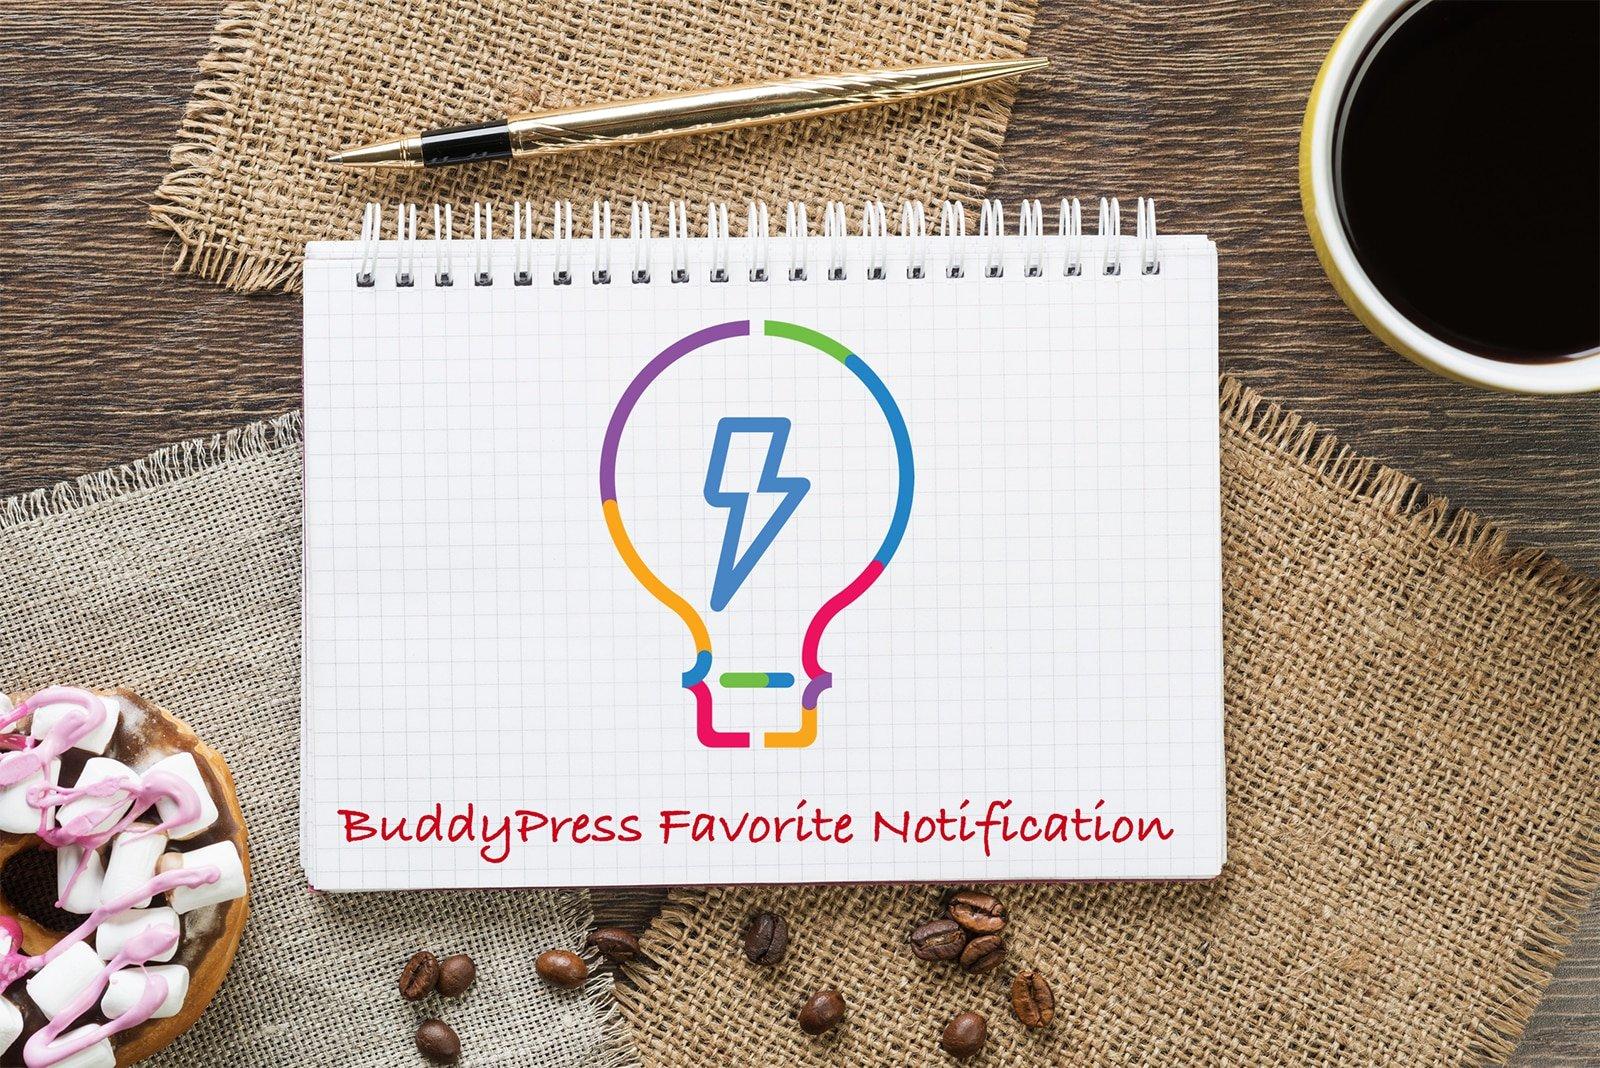 BuddyPress Favorite Notification